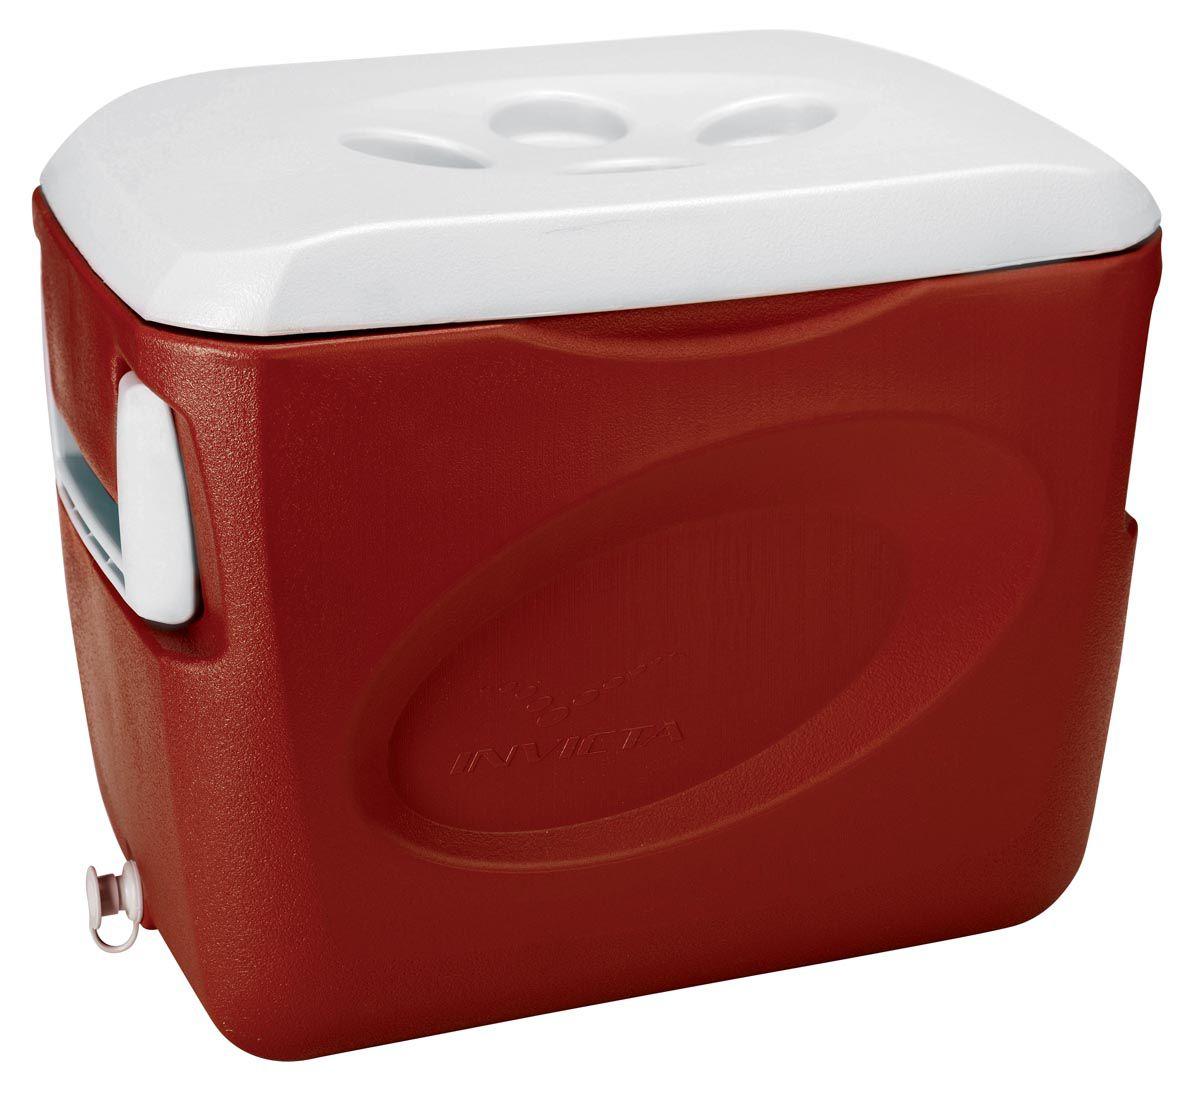 Caixa Térmica Invicta - 45 Litros - Vermelha